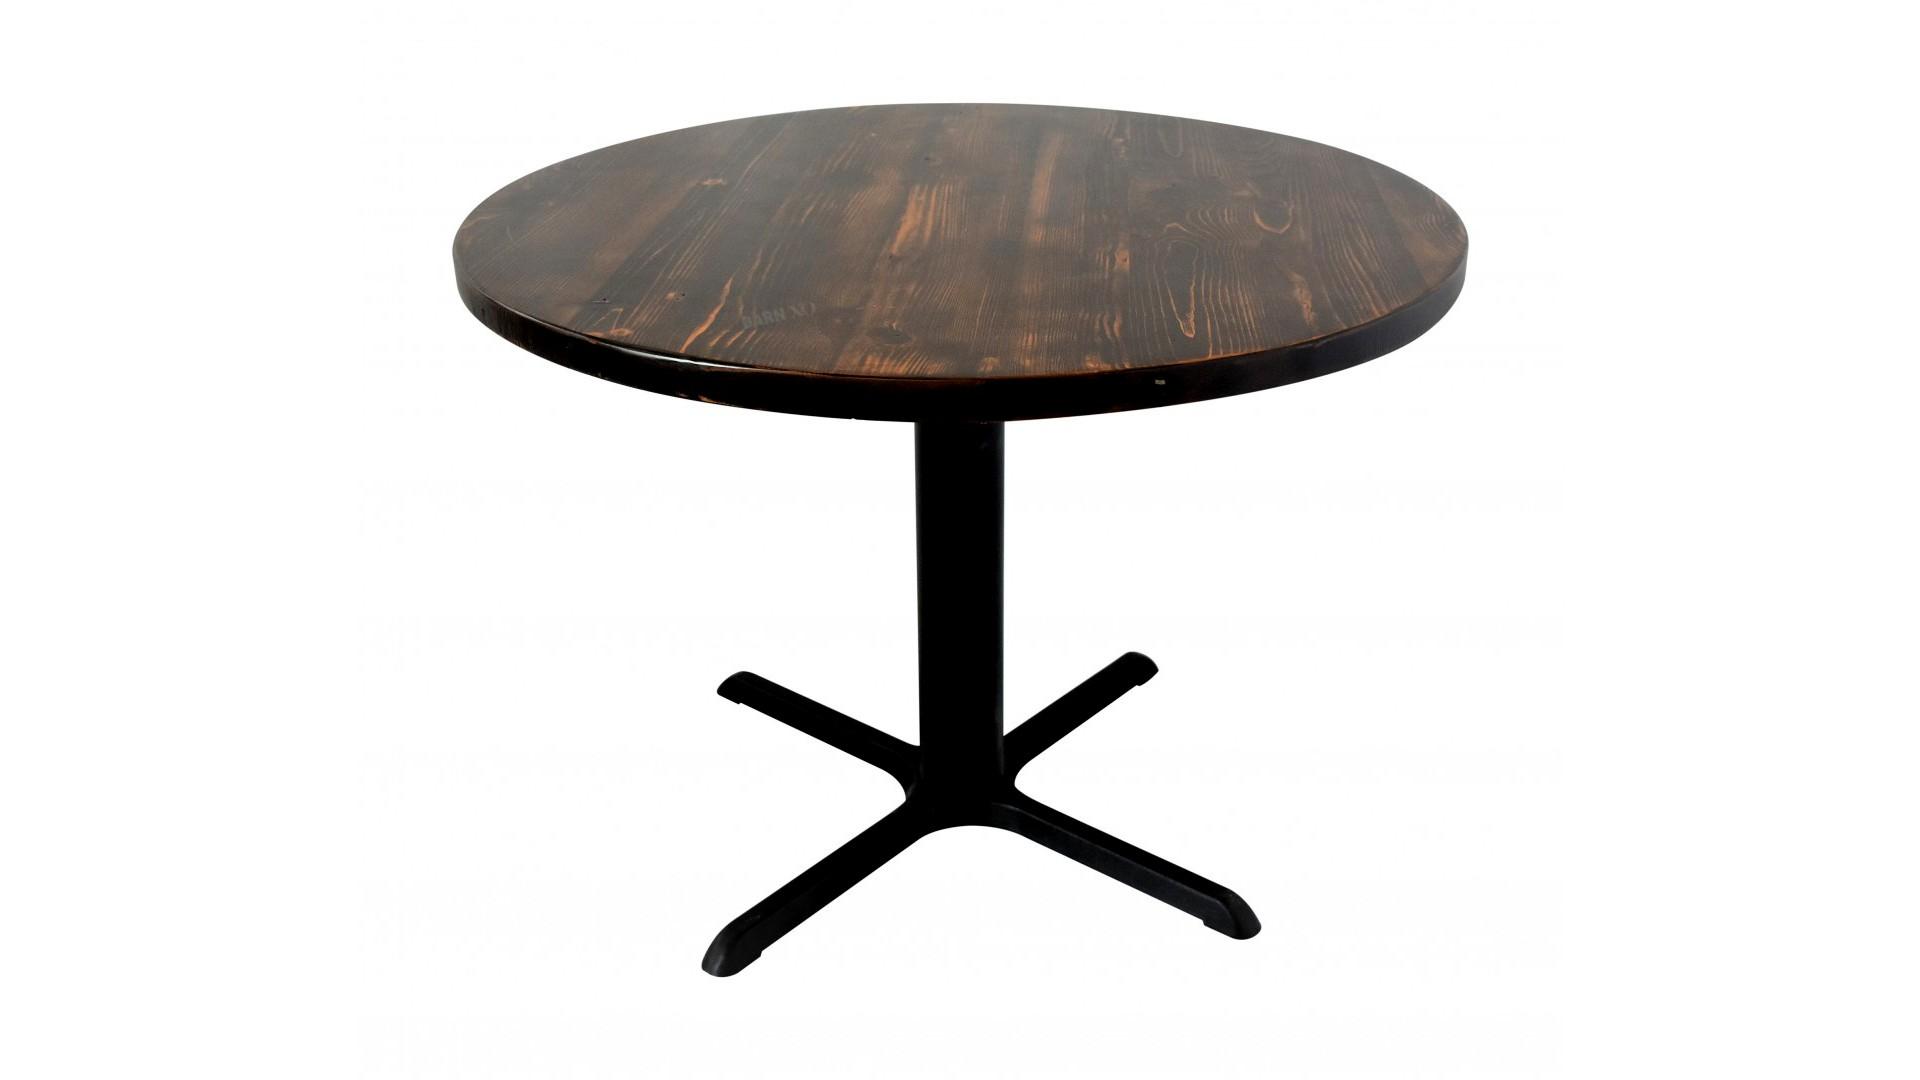 Urban Pedestal Round Table